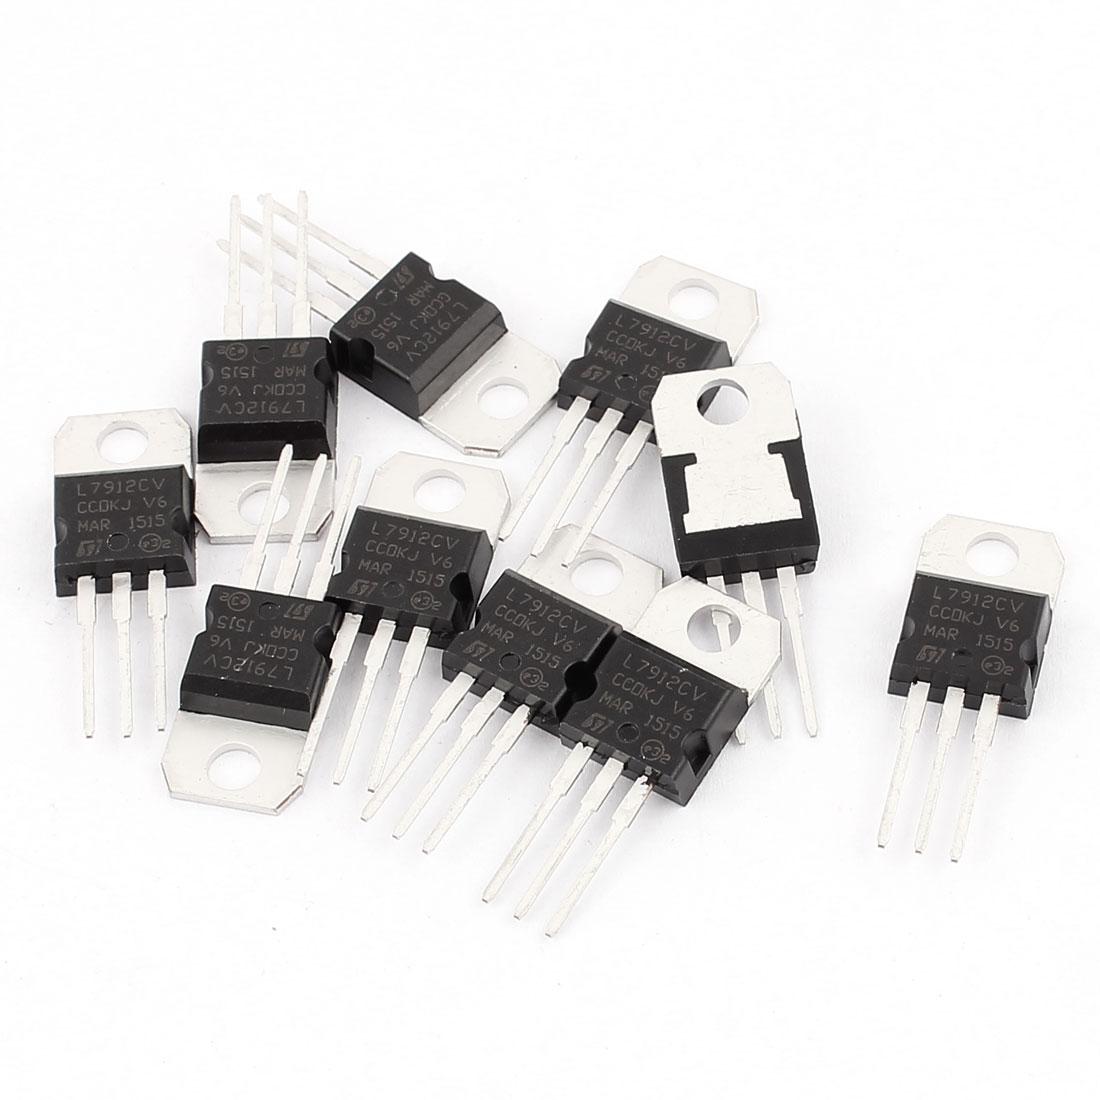 10 Pcs L7912CV 3 Terminals Negative Voltage Regulator 1A 12V TO-220 Package